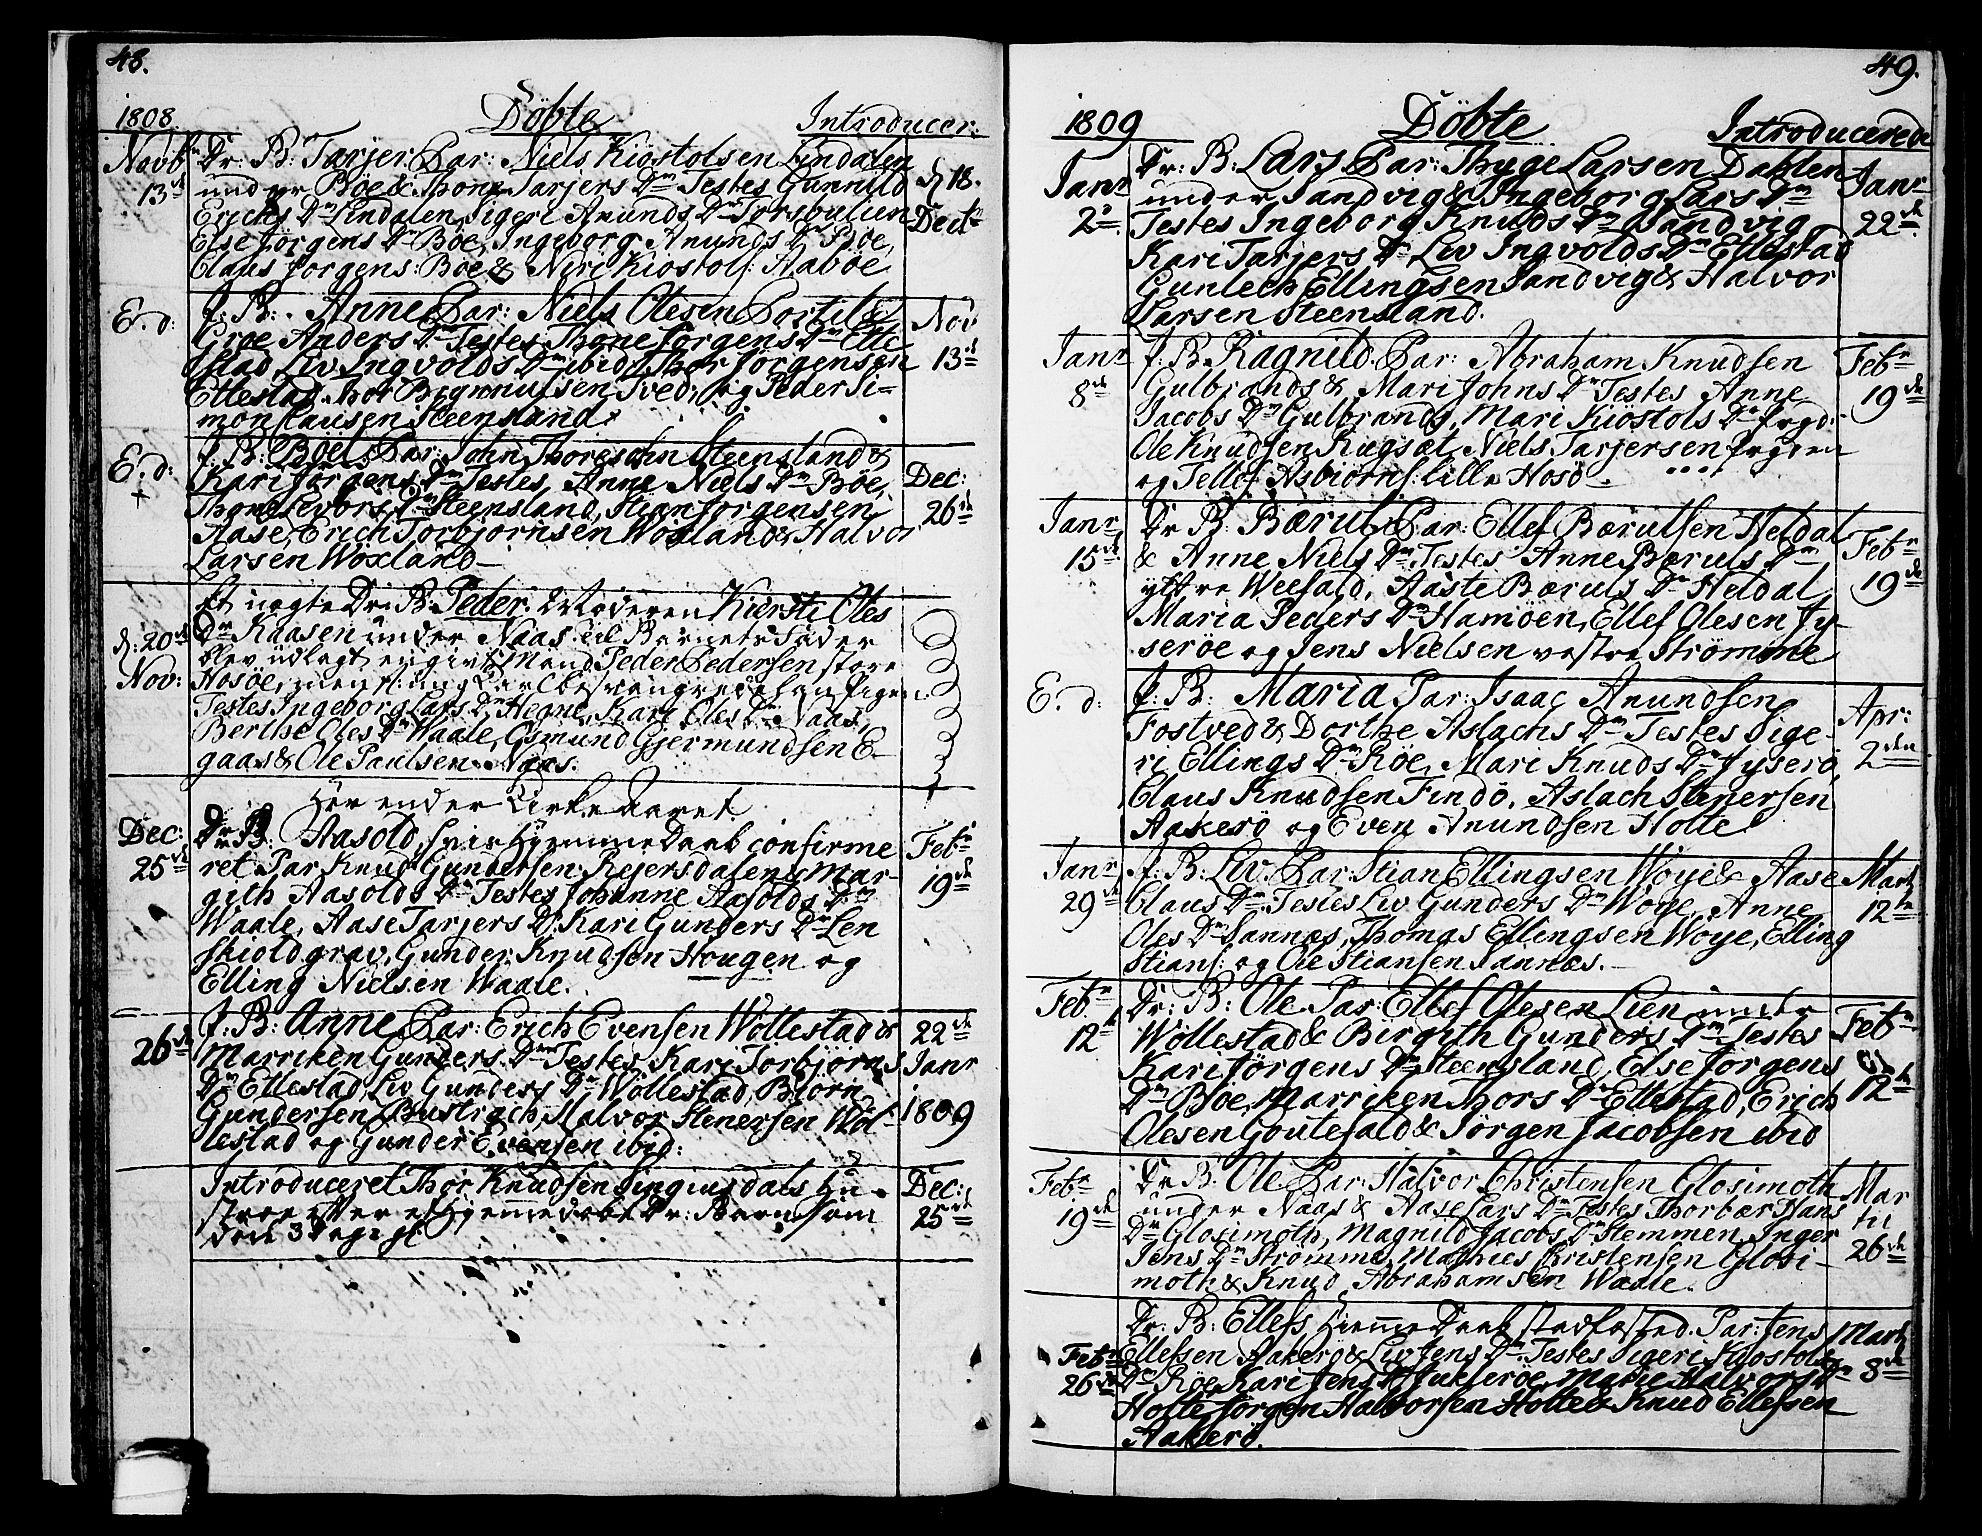 SAKO, Drangedal kirkebøker, F/Fa/L0004: Ministerialbok nr. 4, 1802-1814, s. 48-49